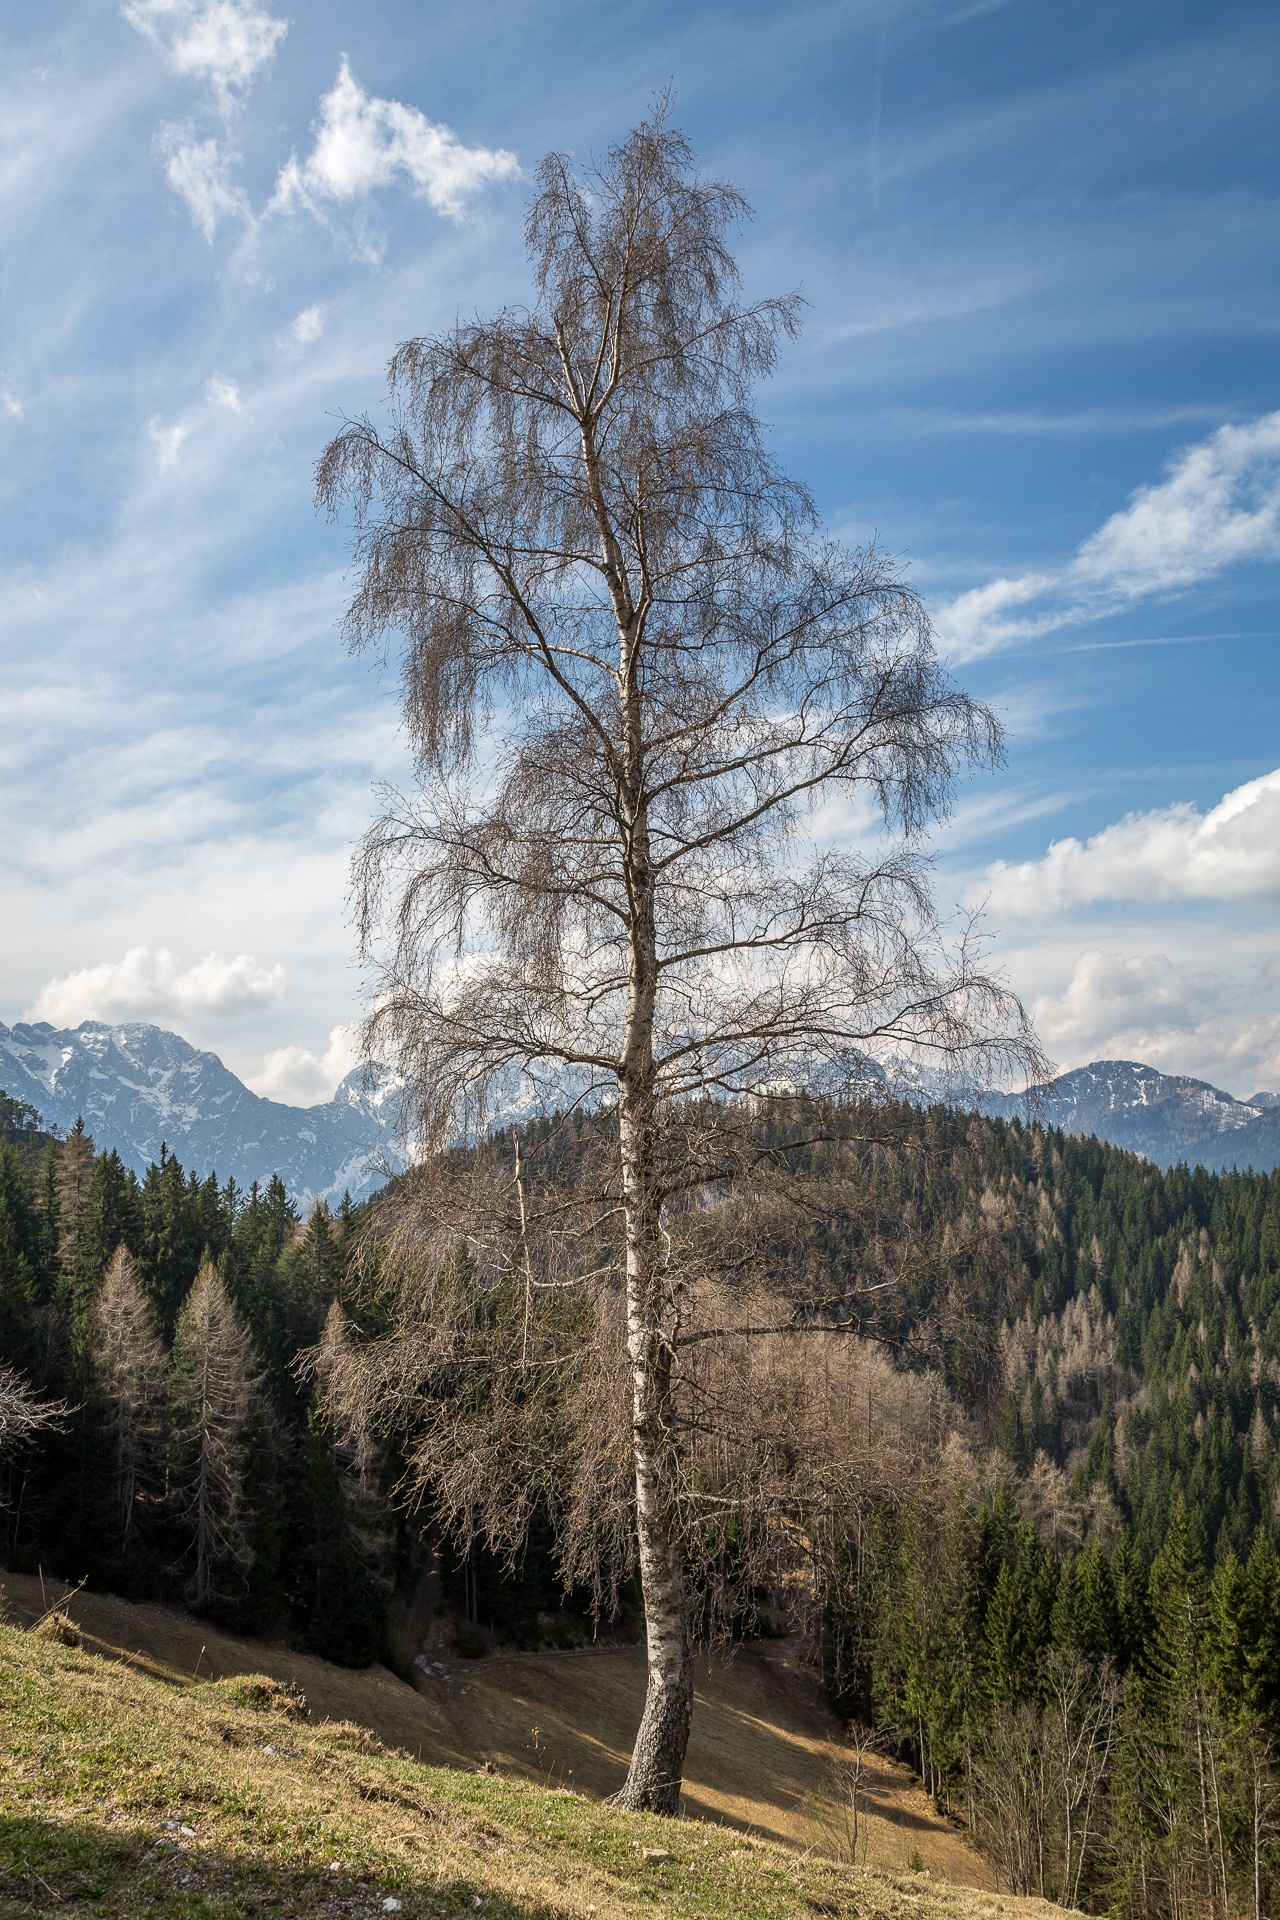 Lone tree among many